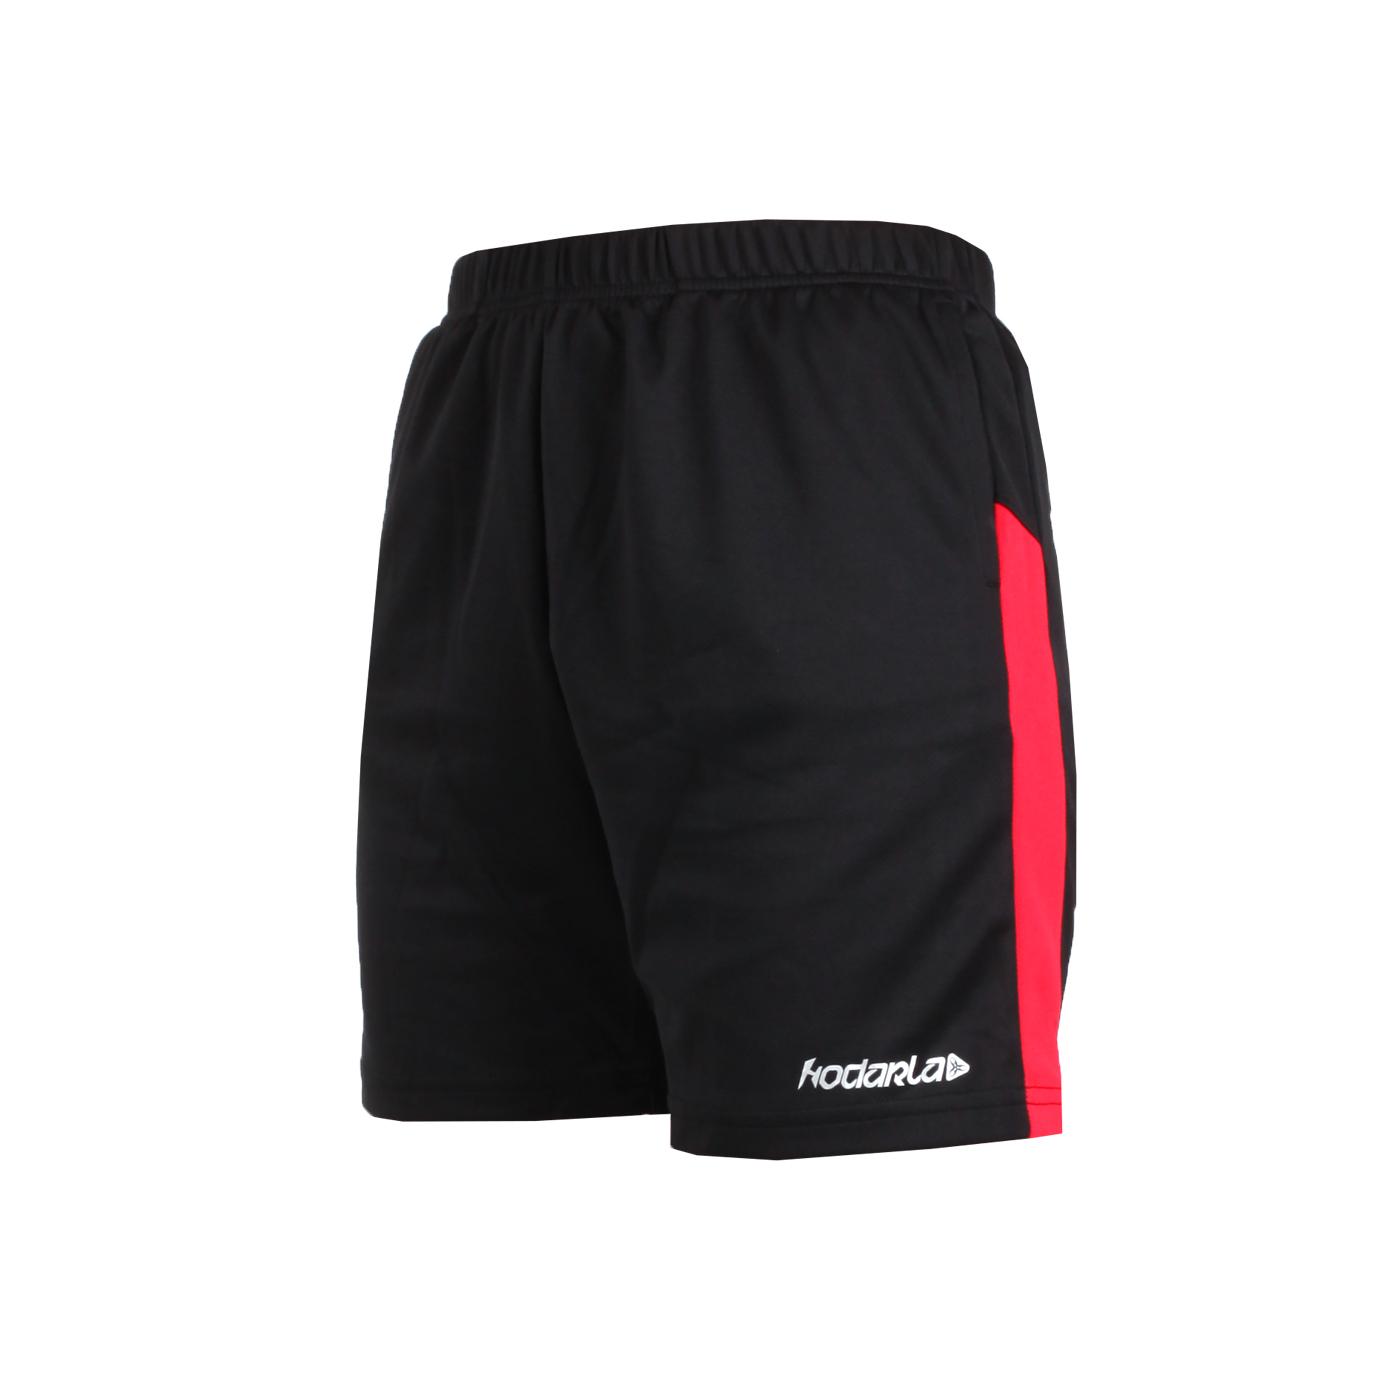 HODARLA 童-奔馳吸濕排汗運動短褲 3144601 - 黑紅